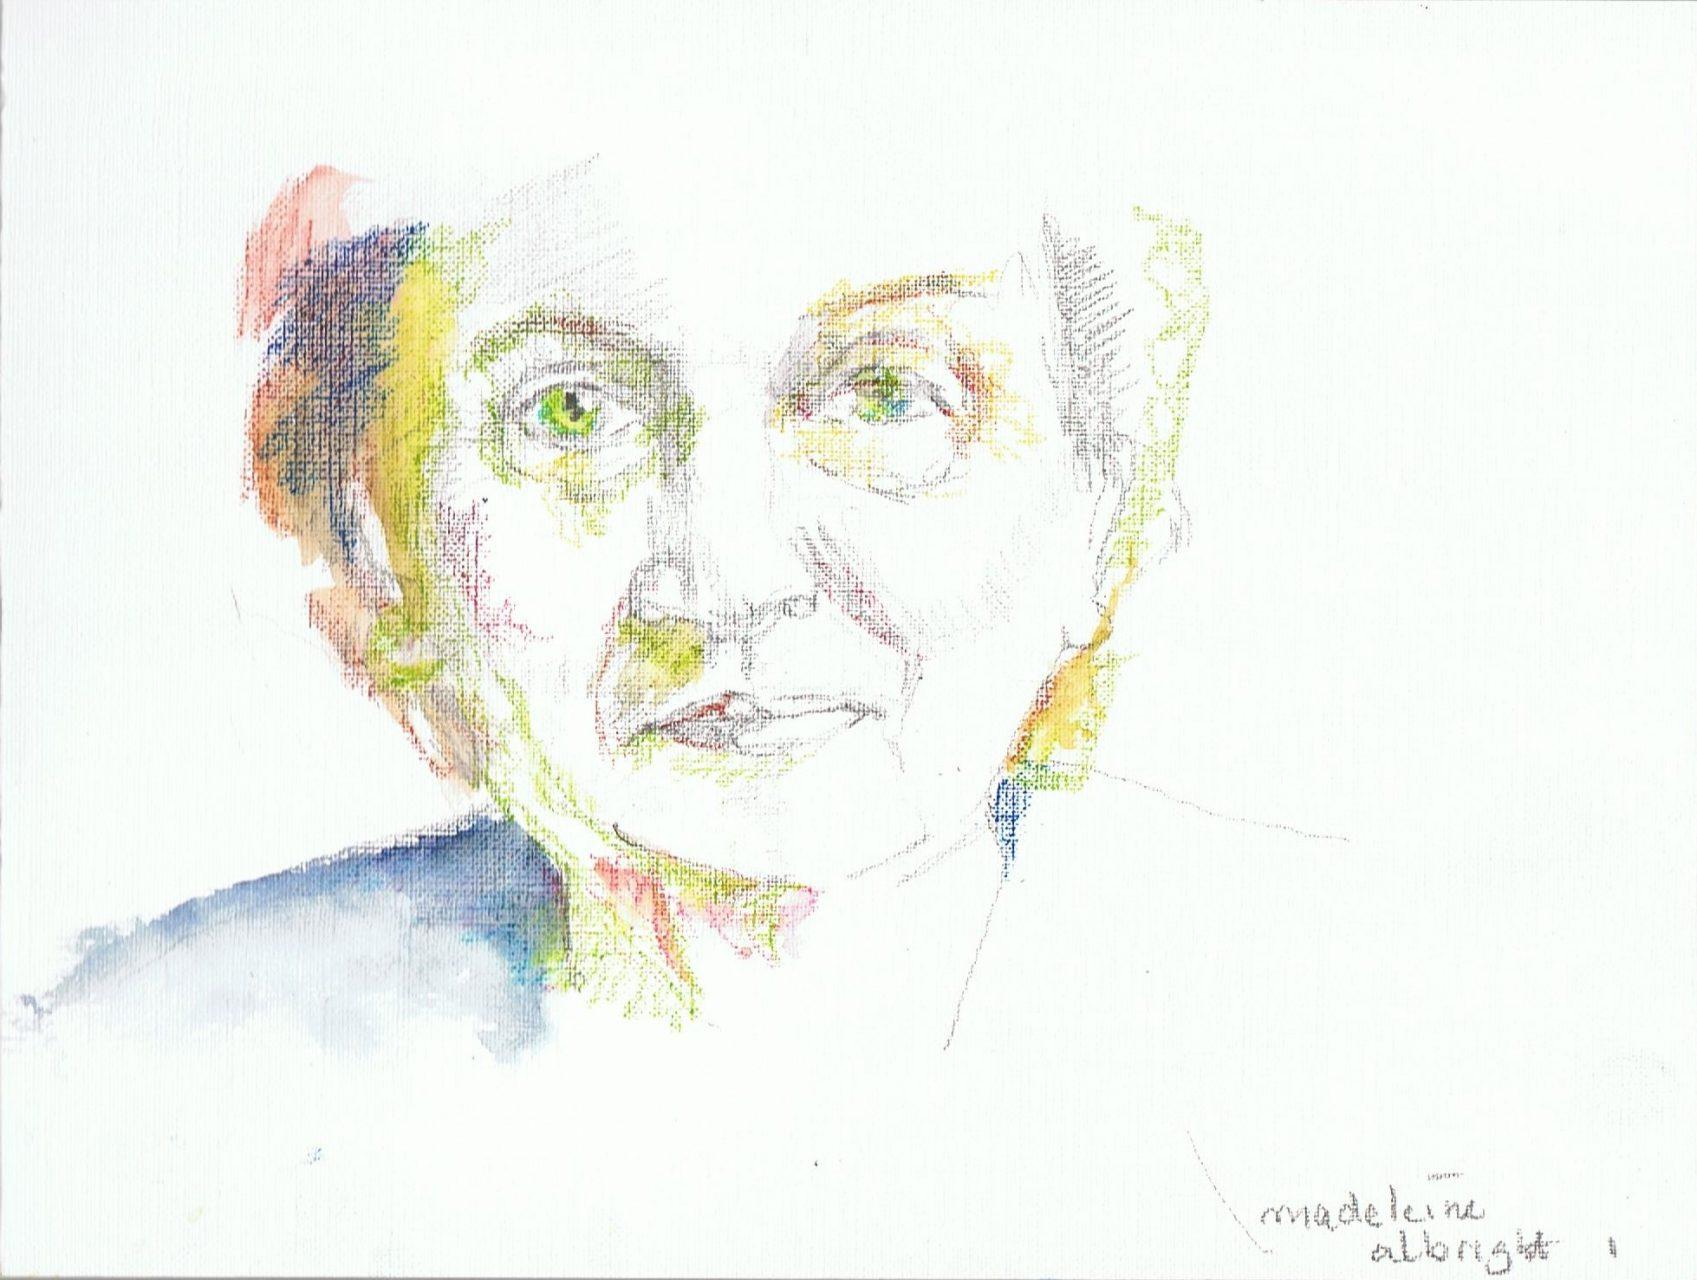 365 dagen een portret, dag 1 Madeleine Albright, politica VS  (2018) Aquarel op papier